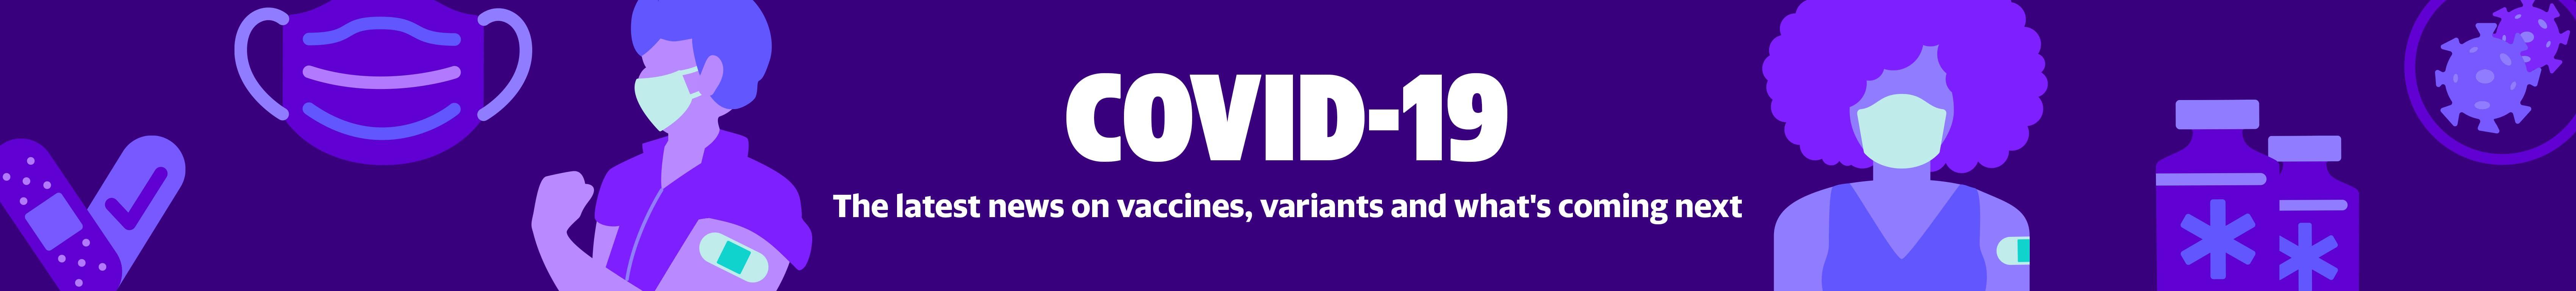 Coronavirus latest news on the global spread and response